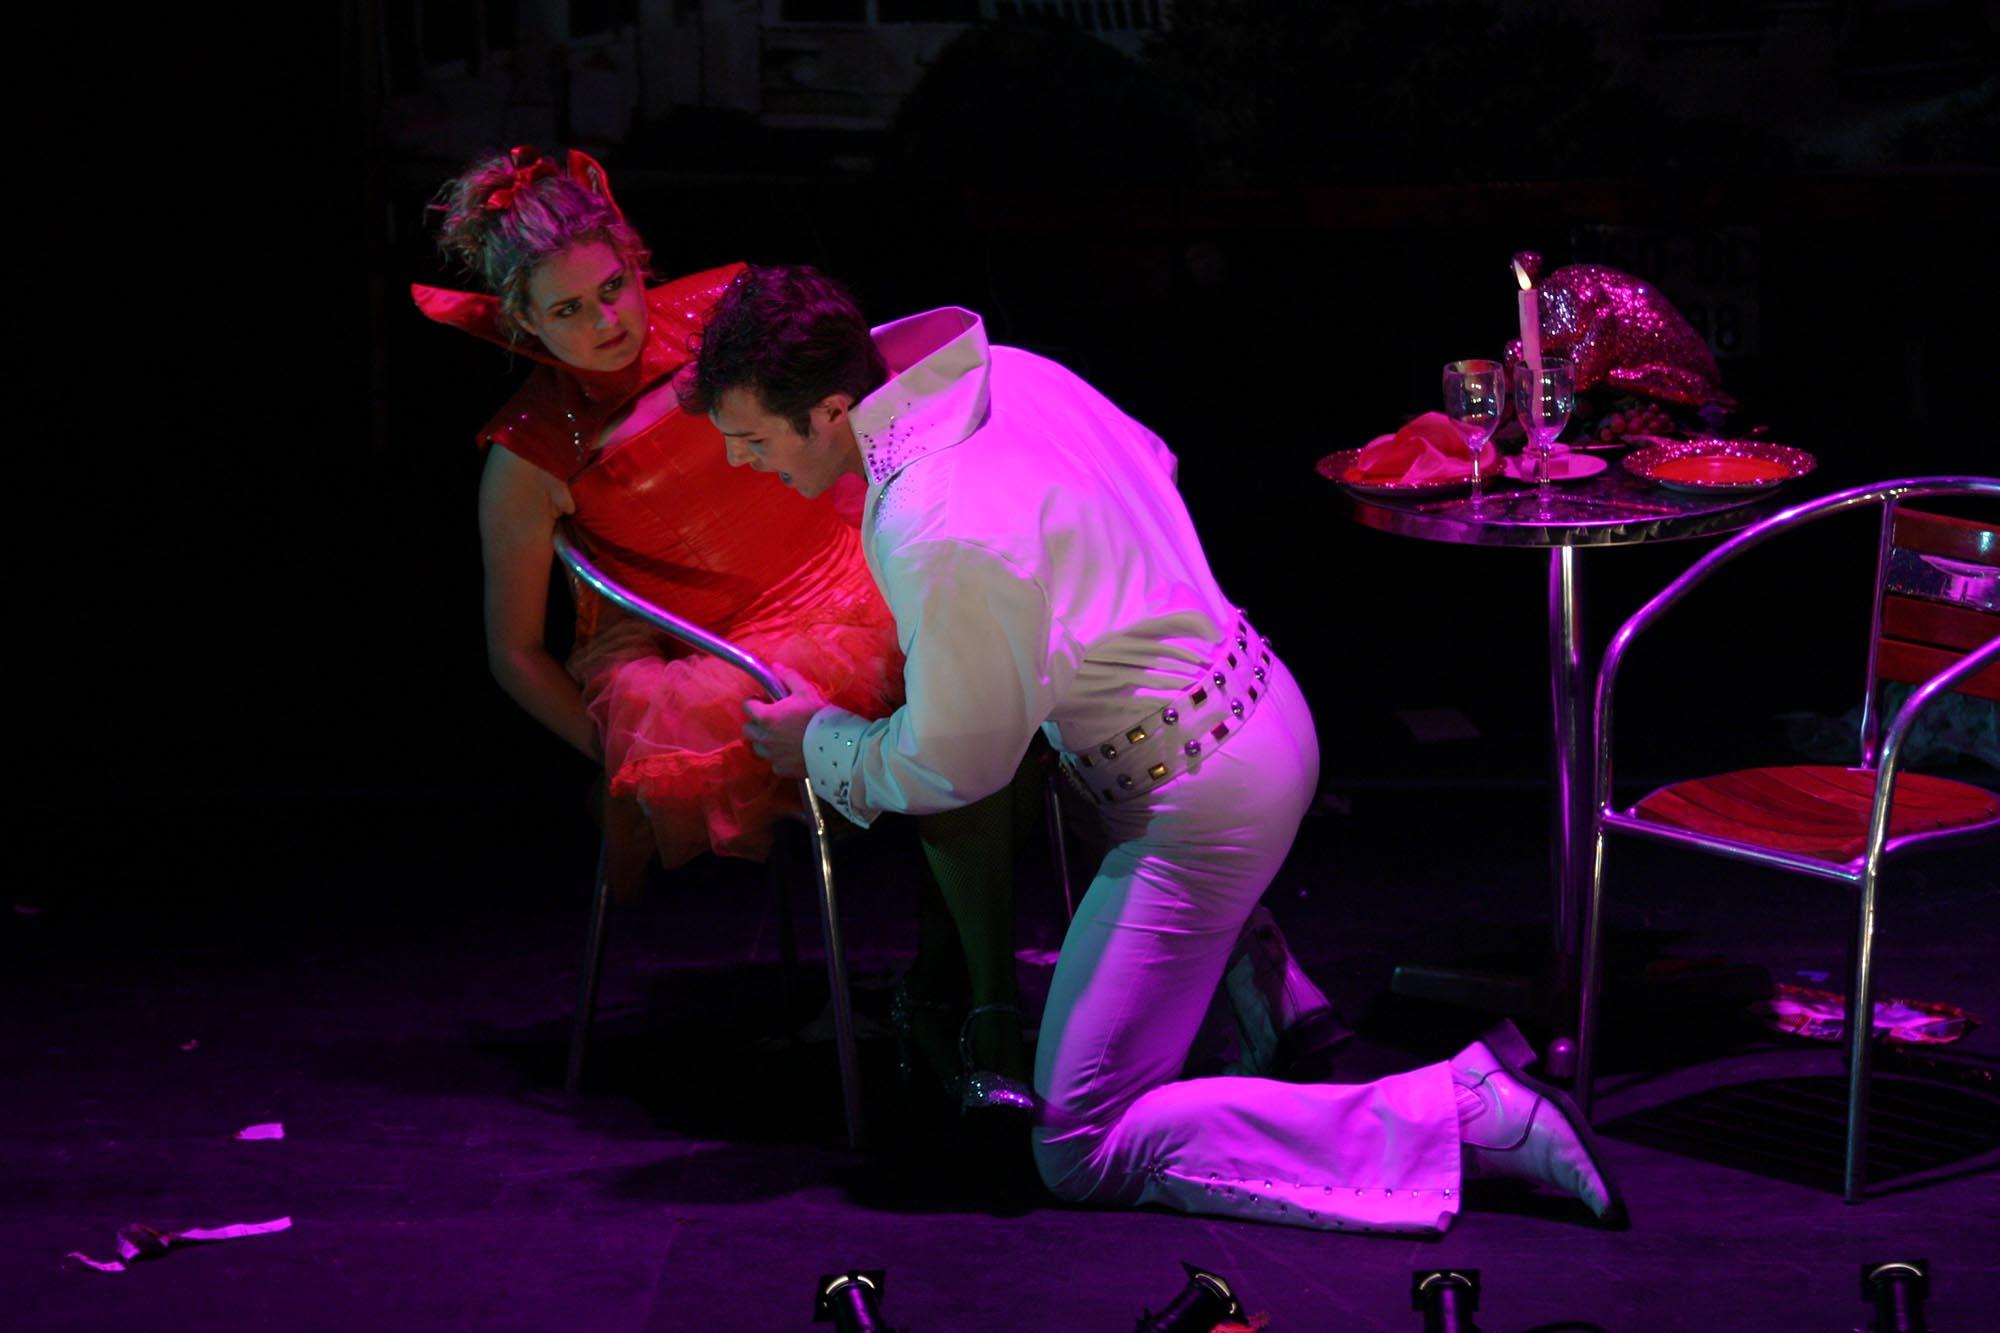 Pagliacci-Opera-Stage-Director-Jacopo-Spirei-7